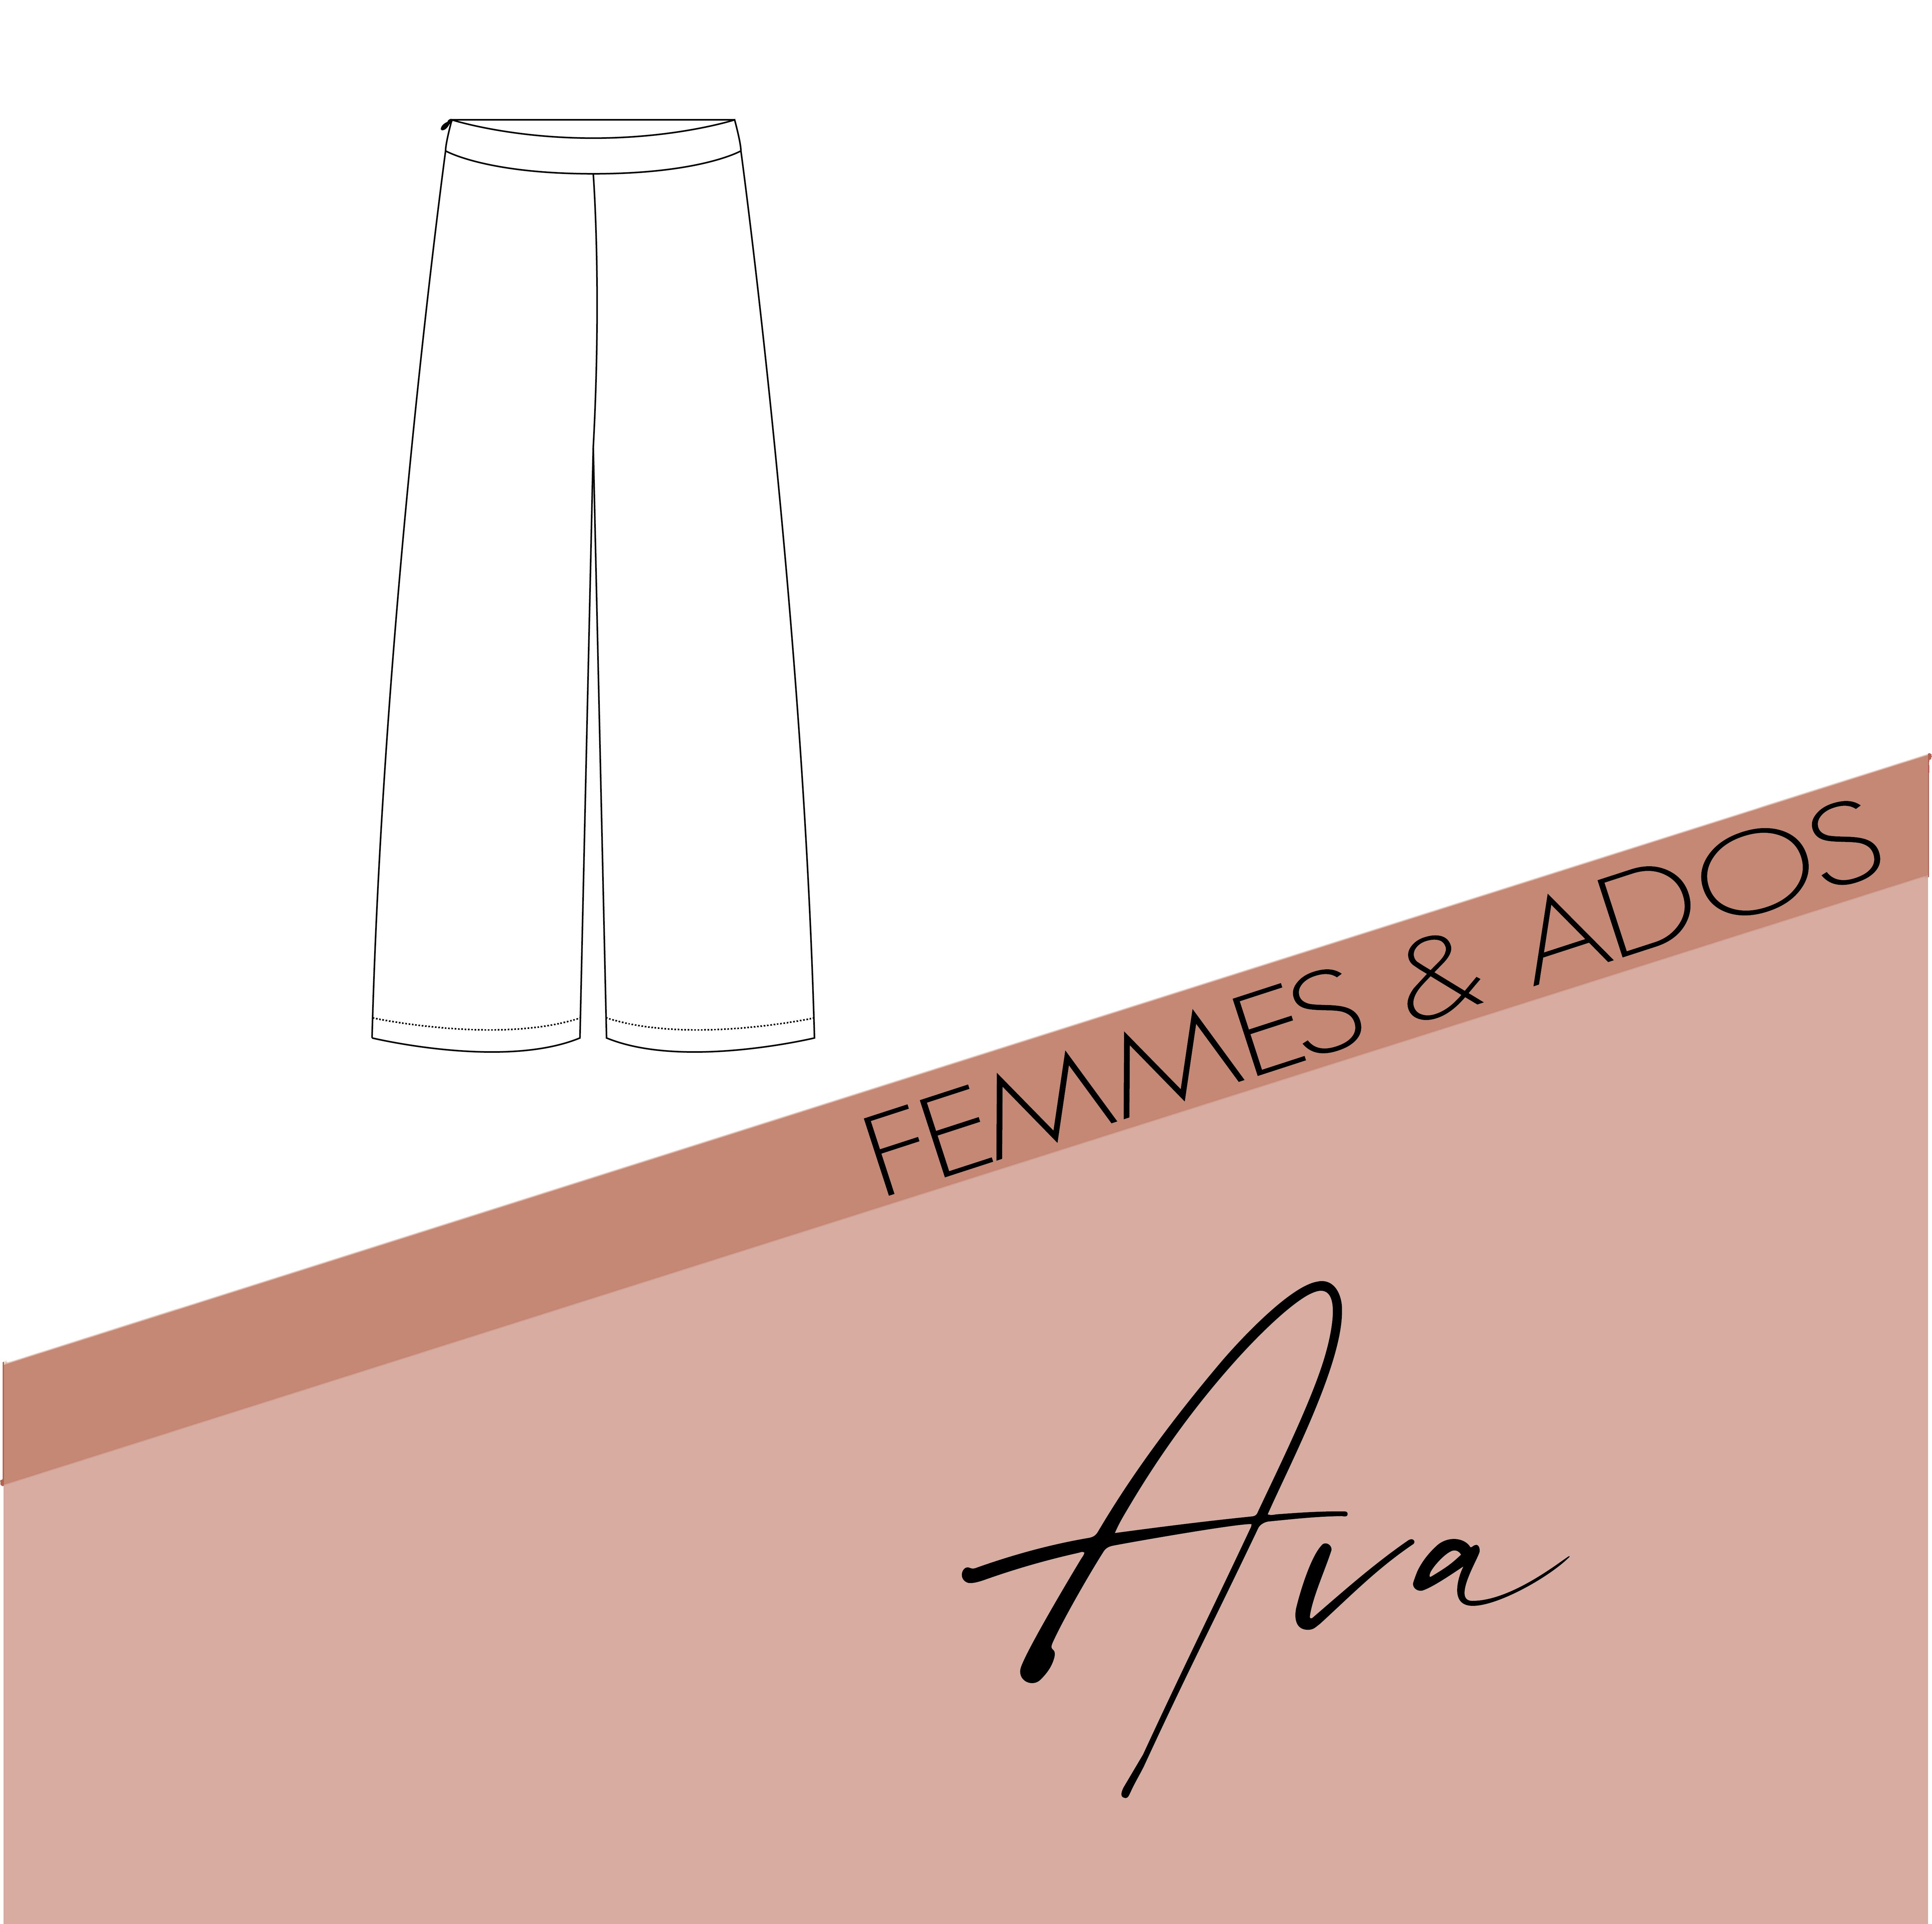 Ava - Femmes & ados